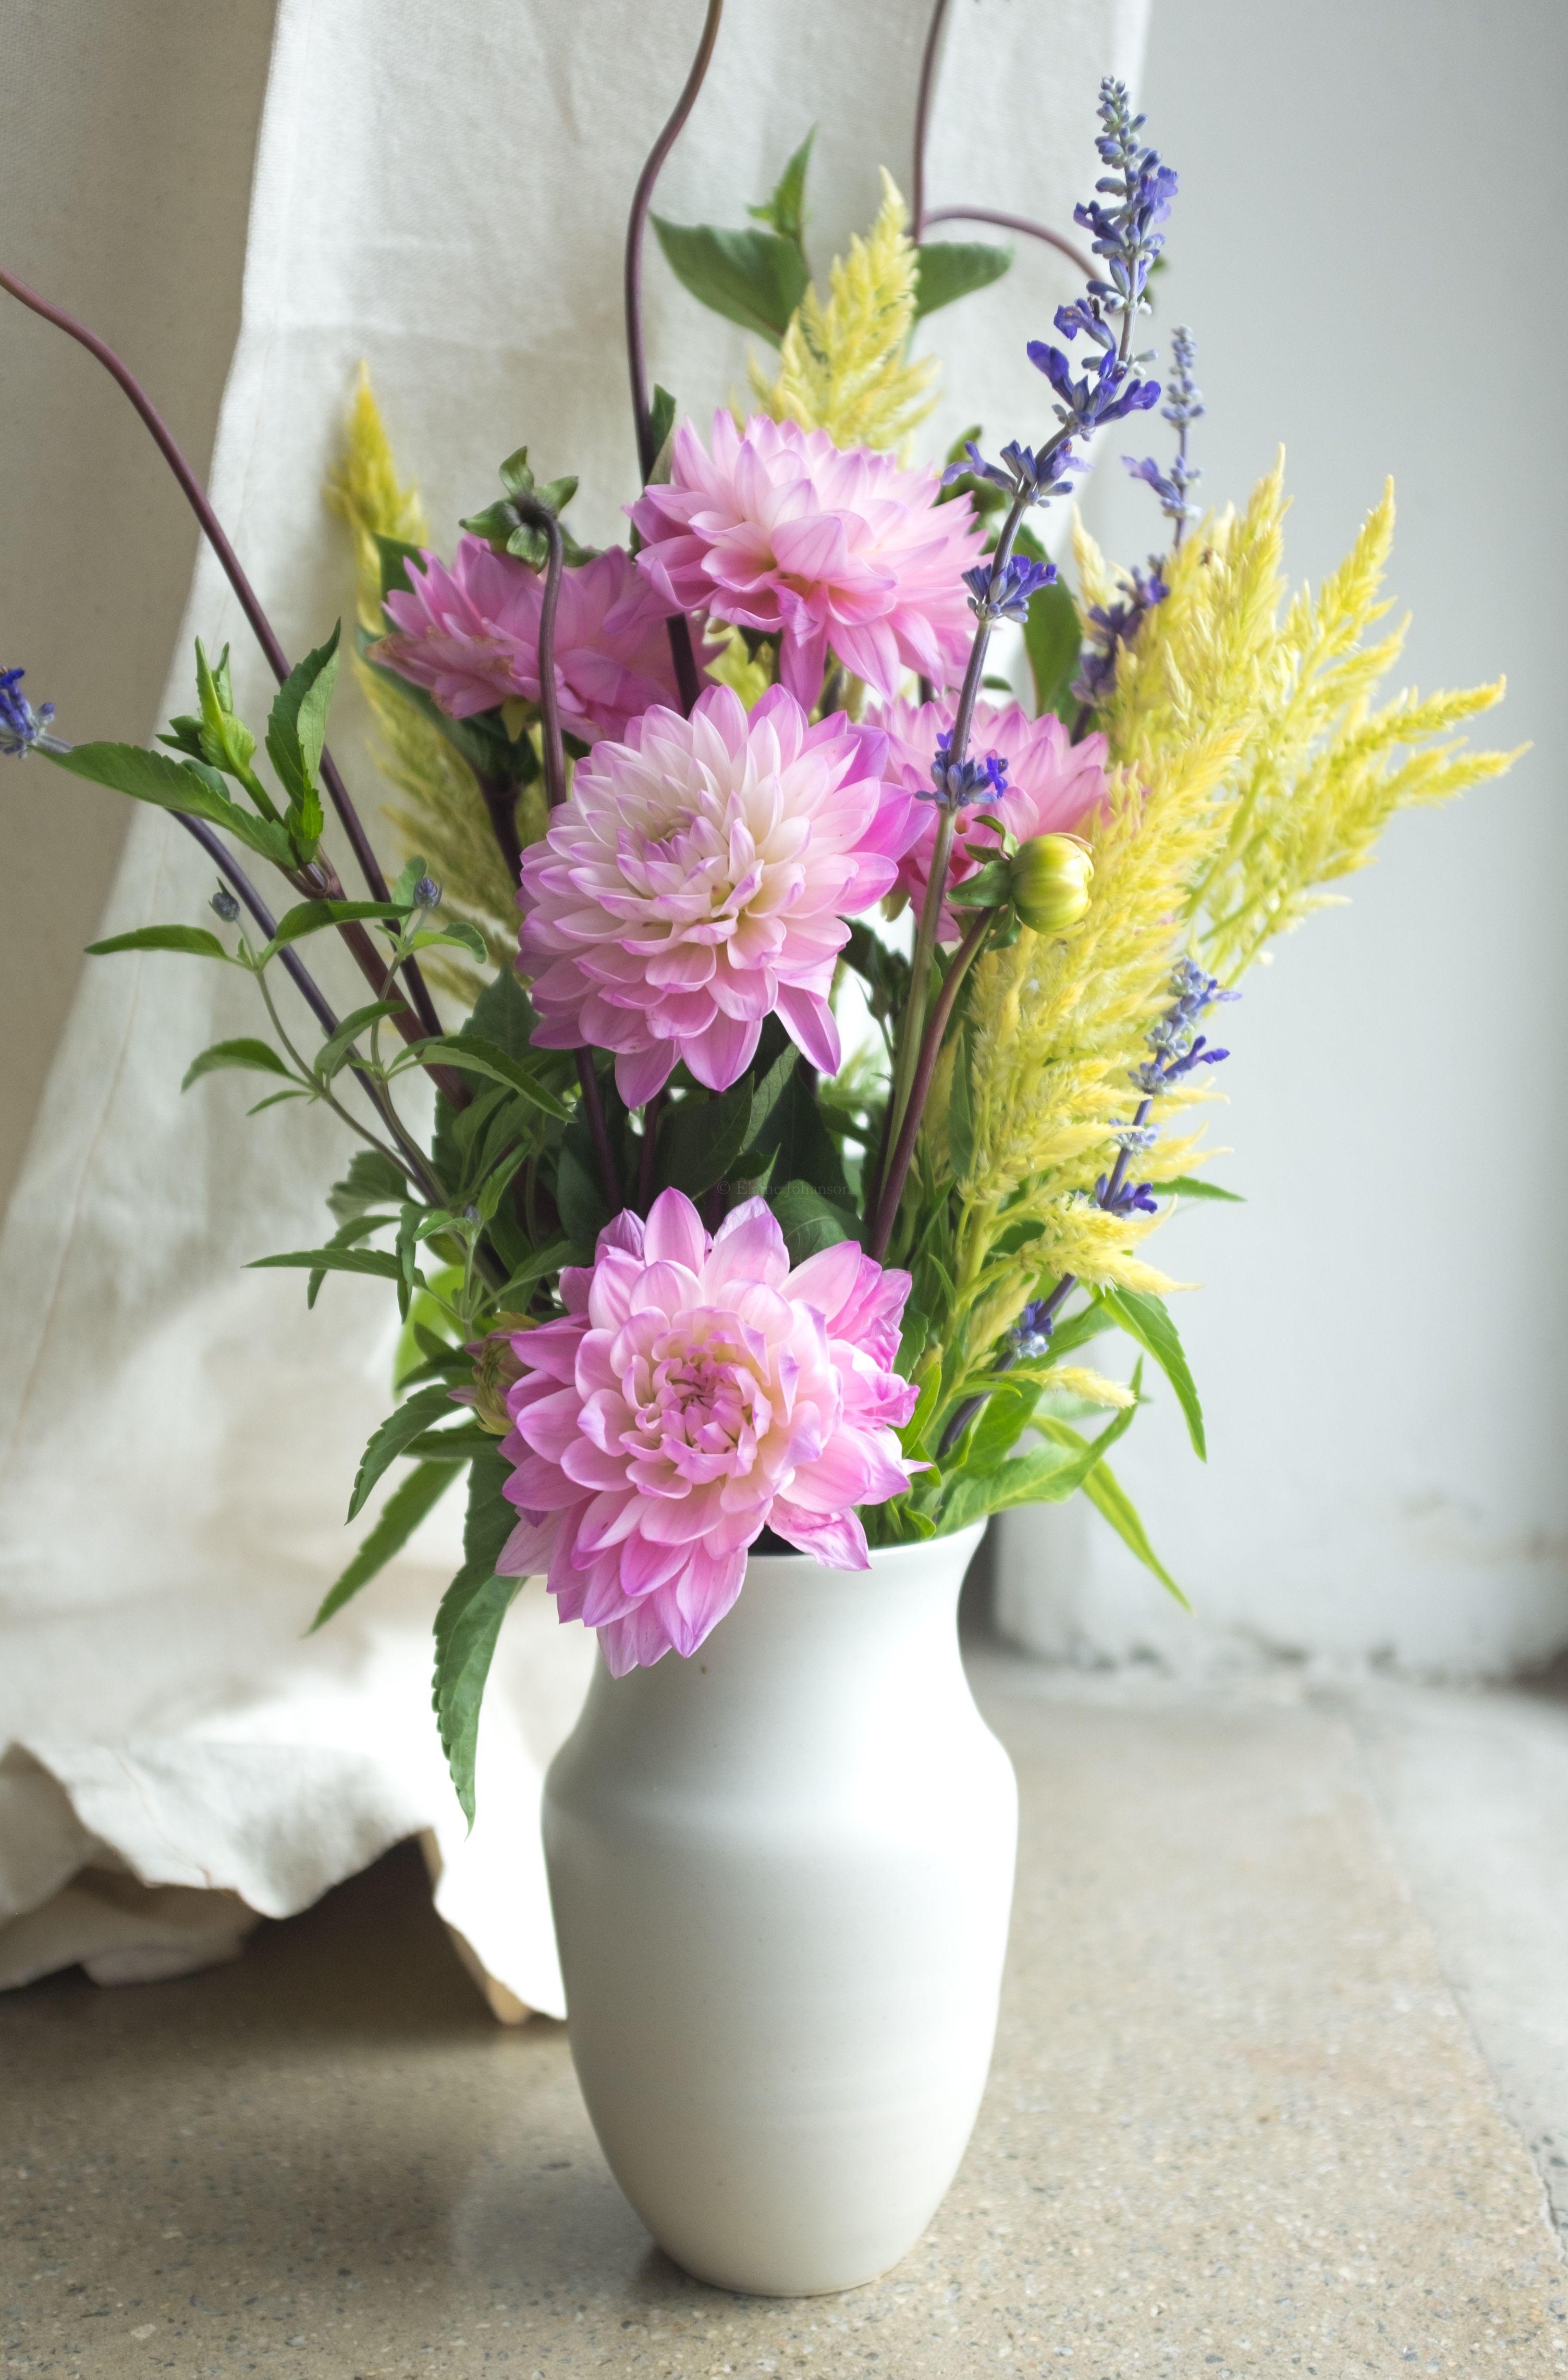 Poet Studio celadon vase with late summer Lancaster County